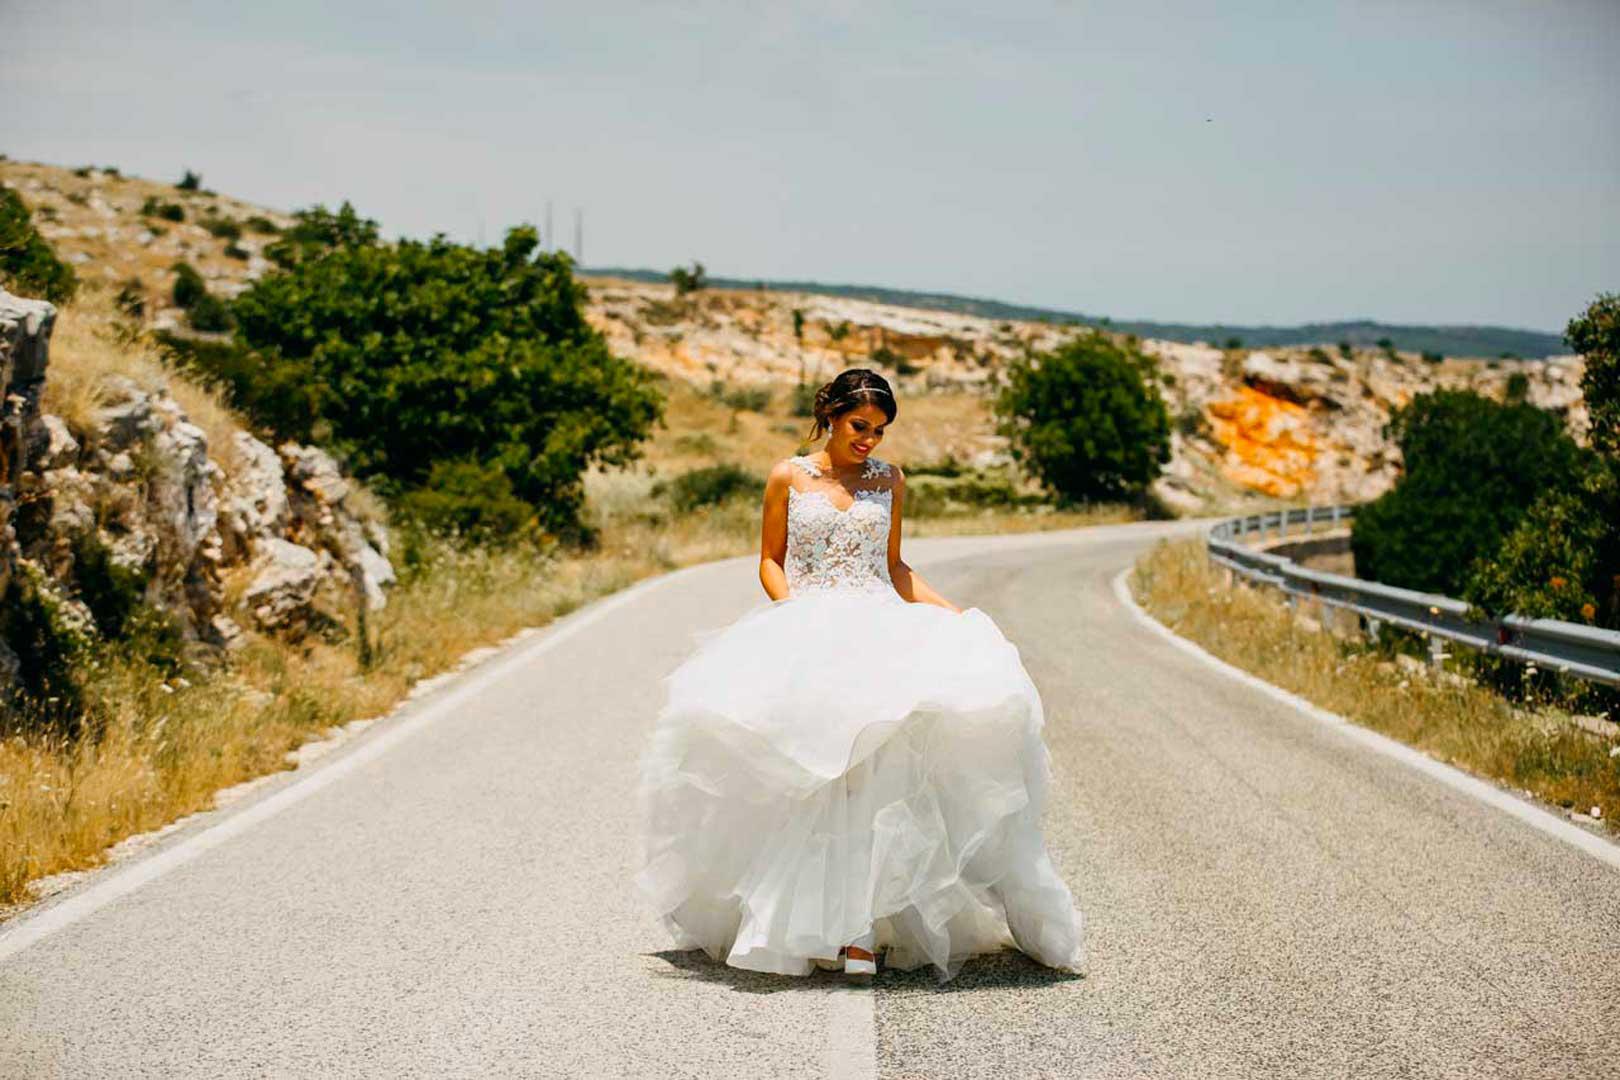 030-sposa-particolare-gianni-lepore-wedding-photographer